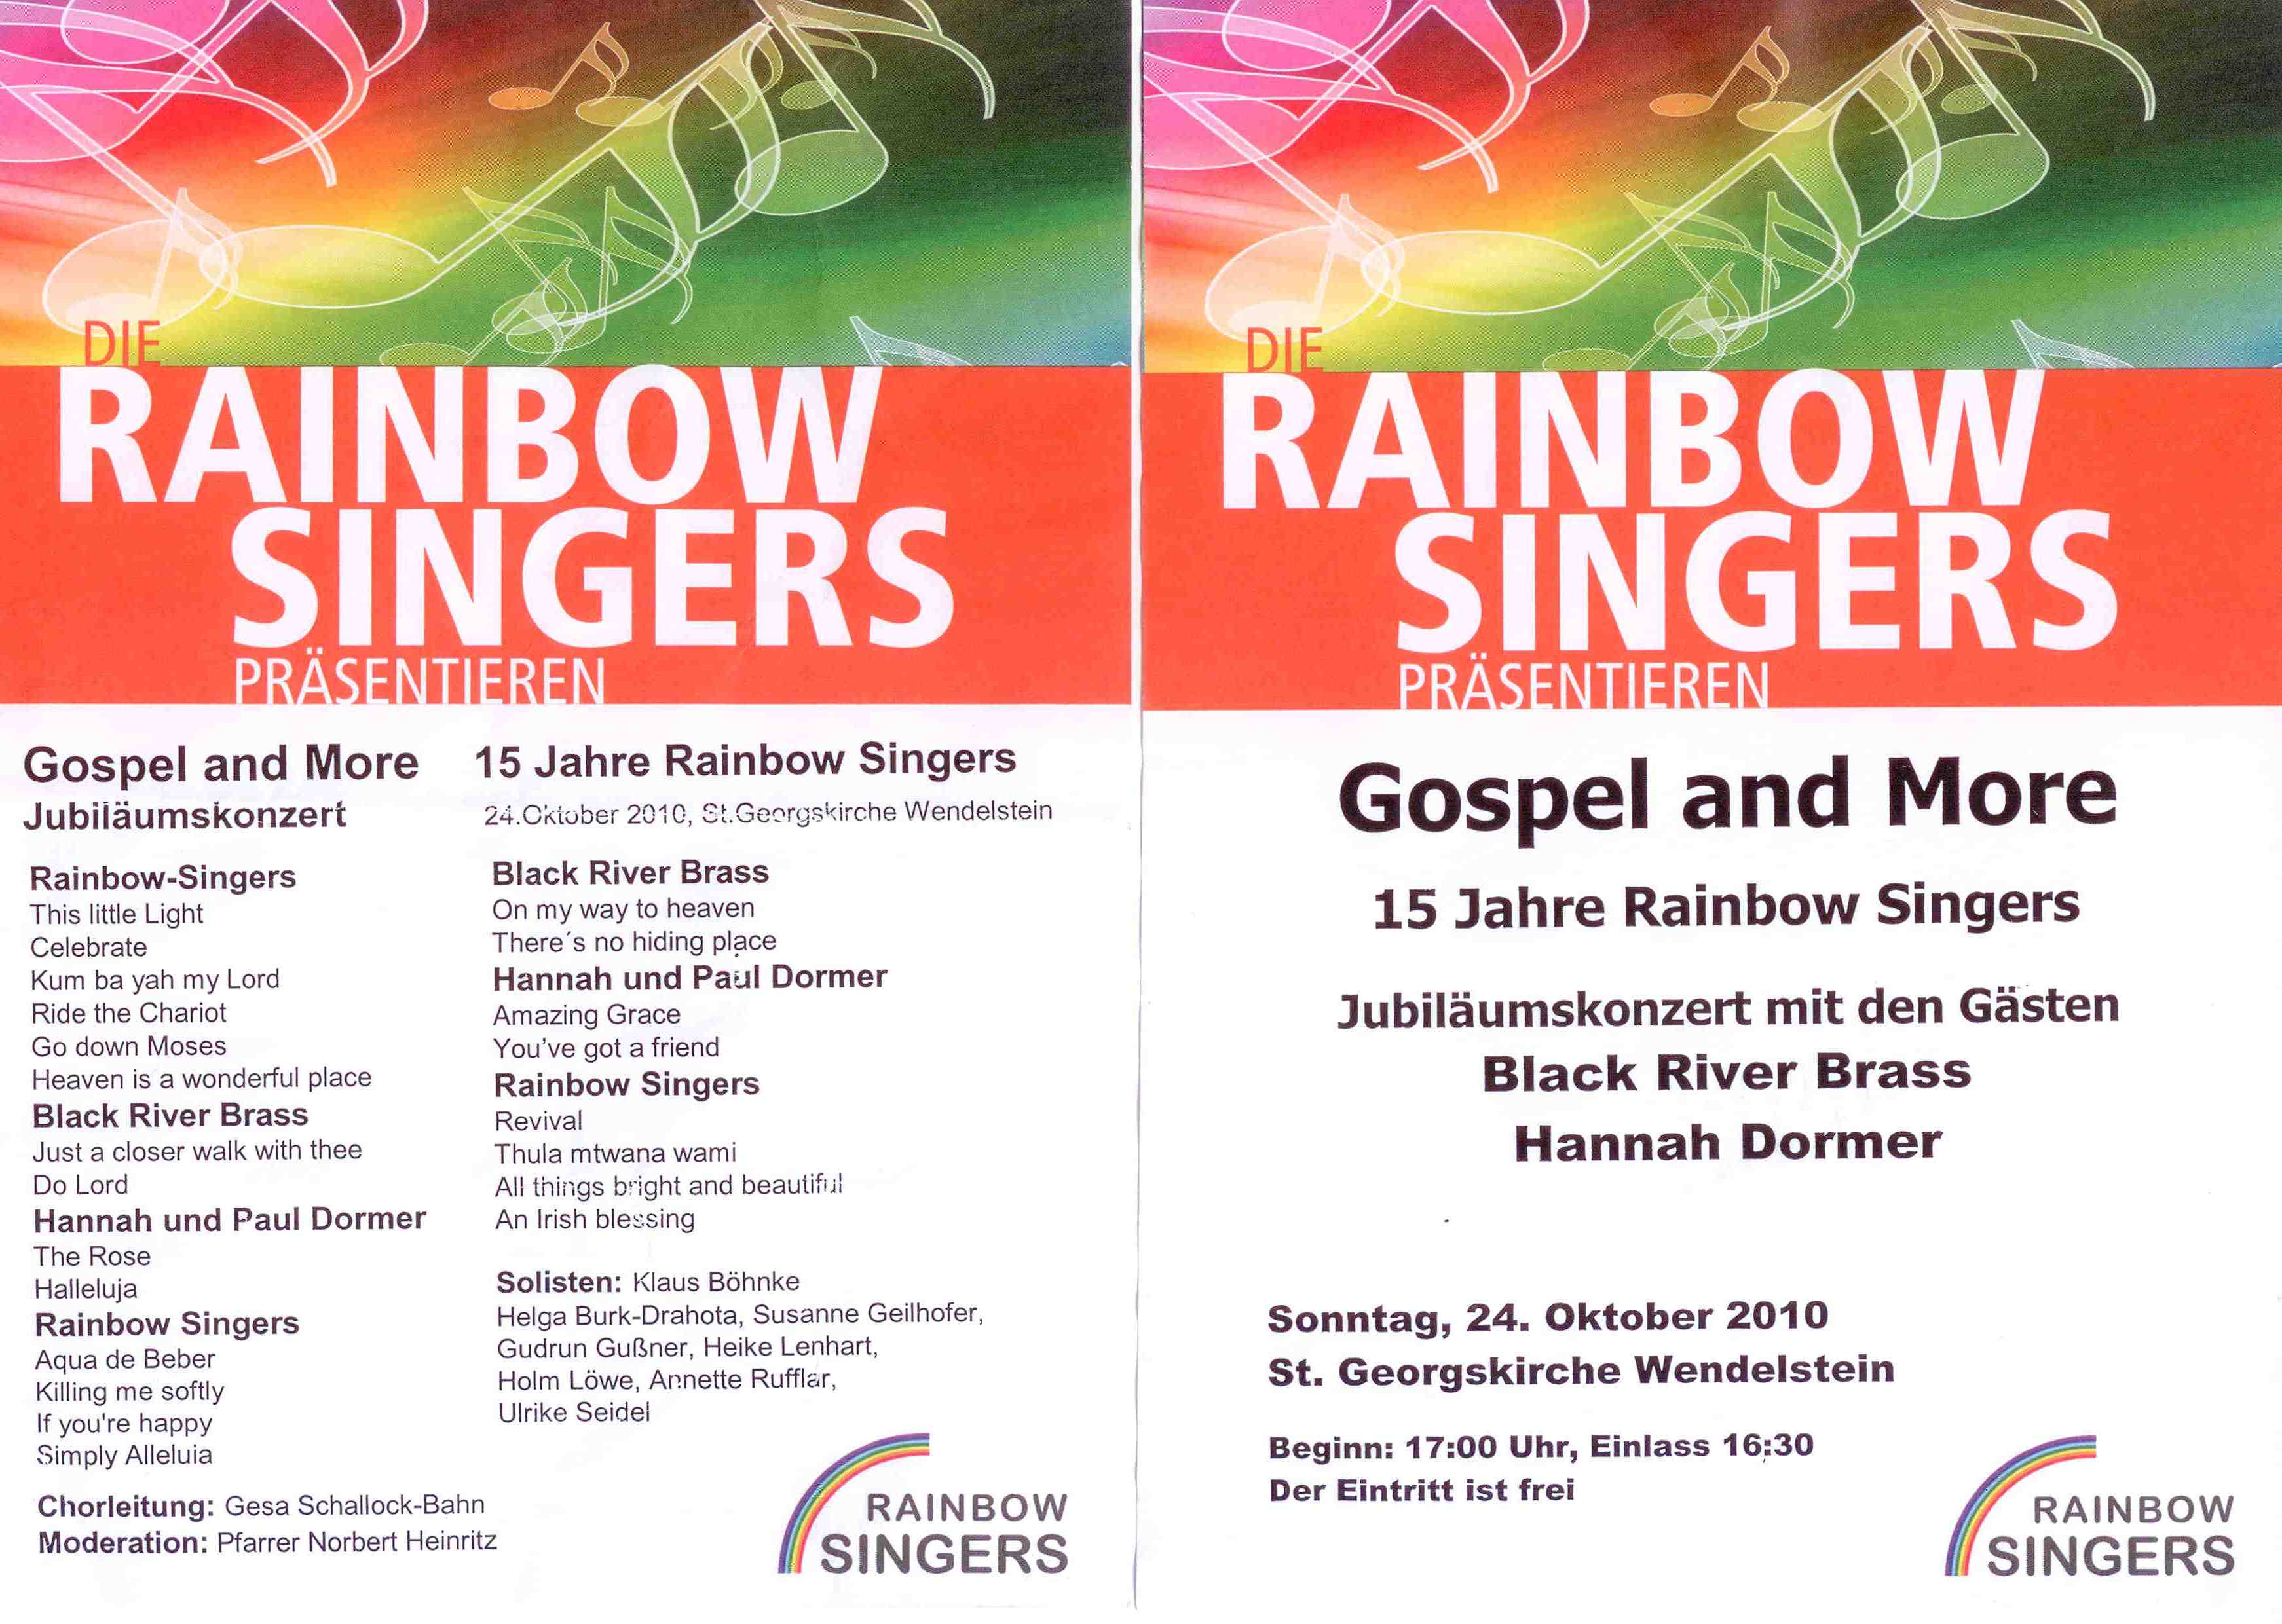 Konzert Rainbow Singers Programm 24.10.2010